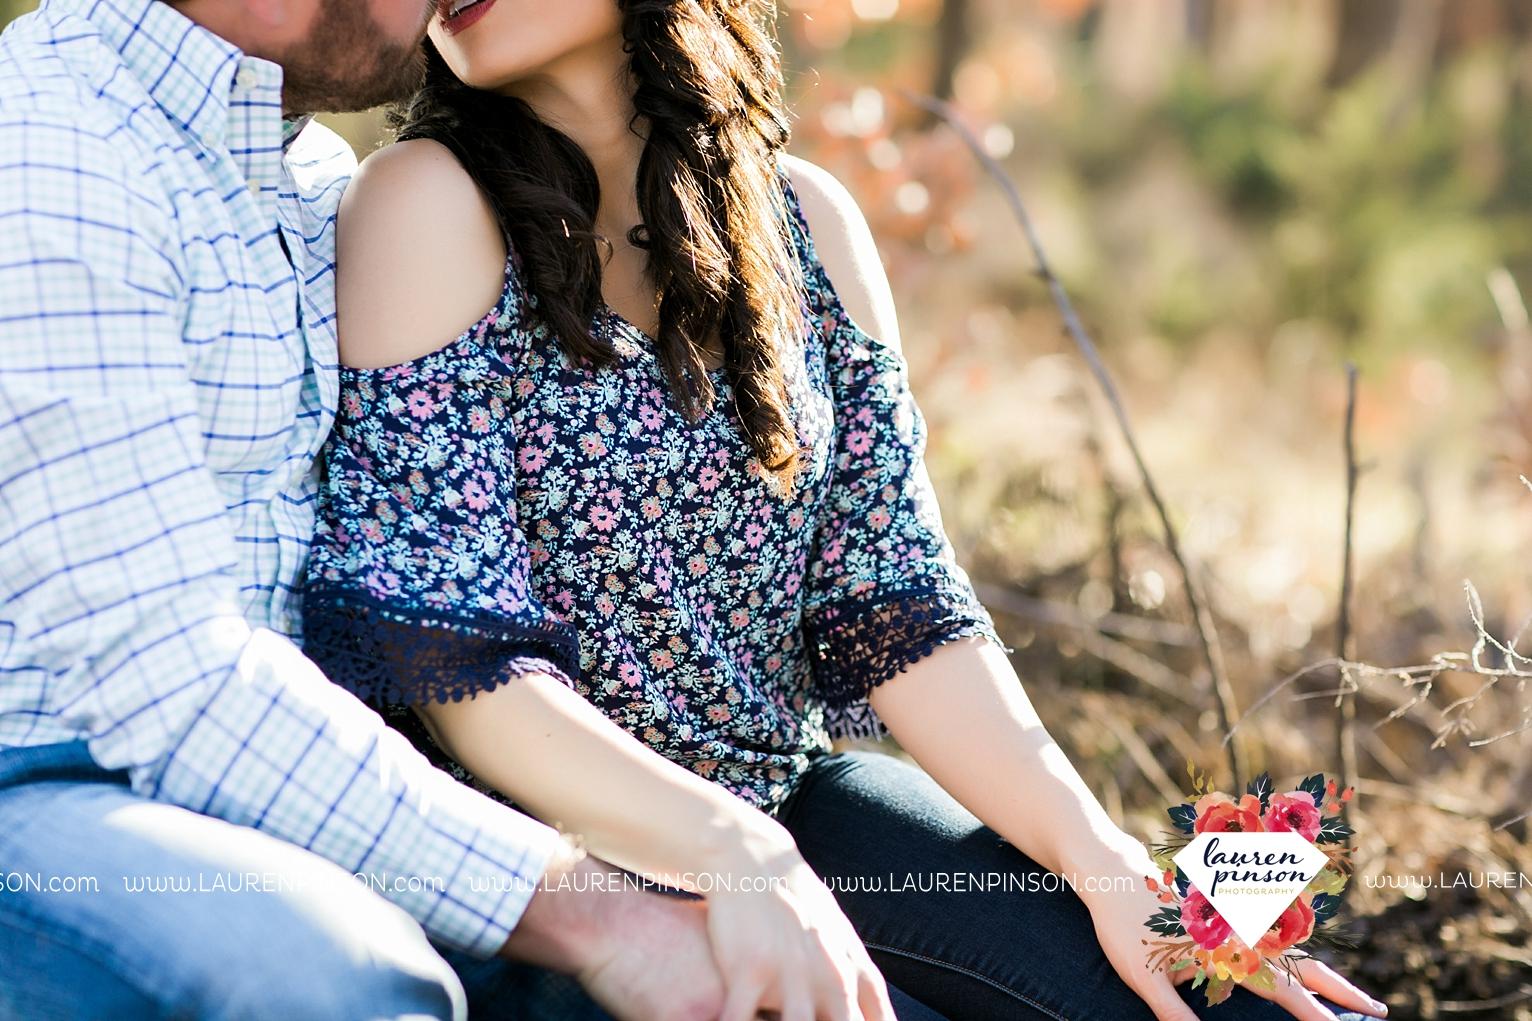 wichita-falls-texas-engagement-photographer-wedding-oklahoma-lawton-wichita-mountains-refuge-outdoors-mountains-engaged_2049.jpg